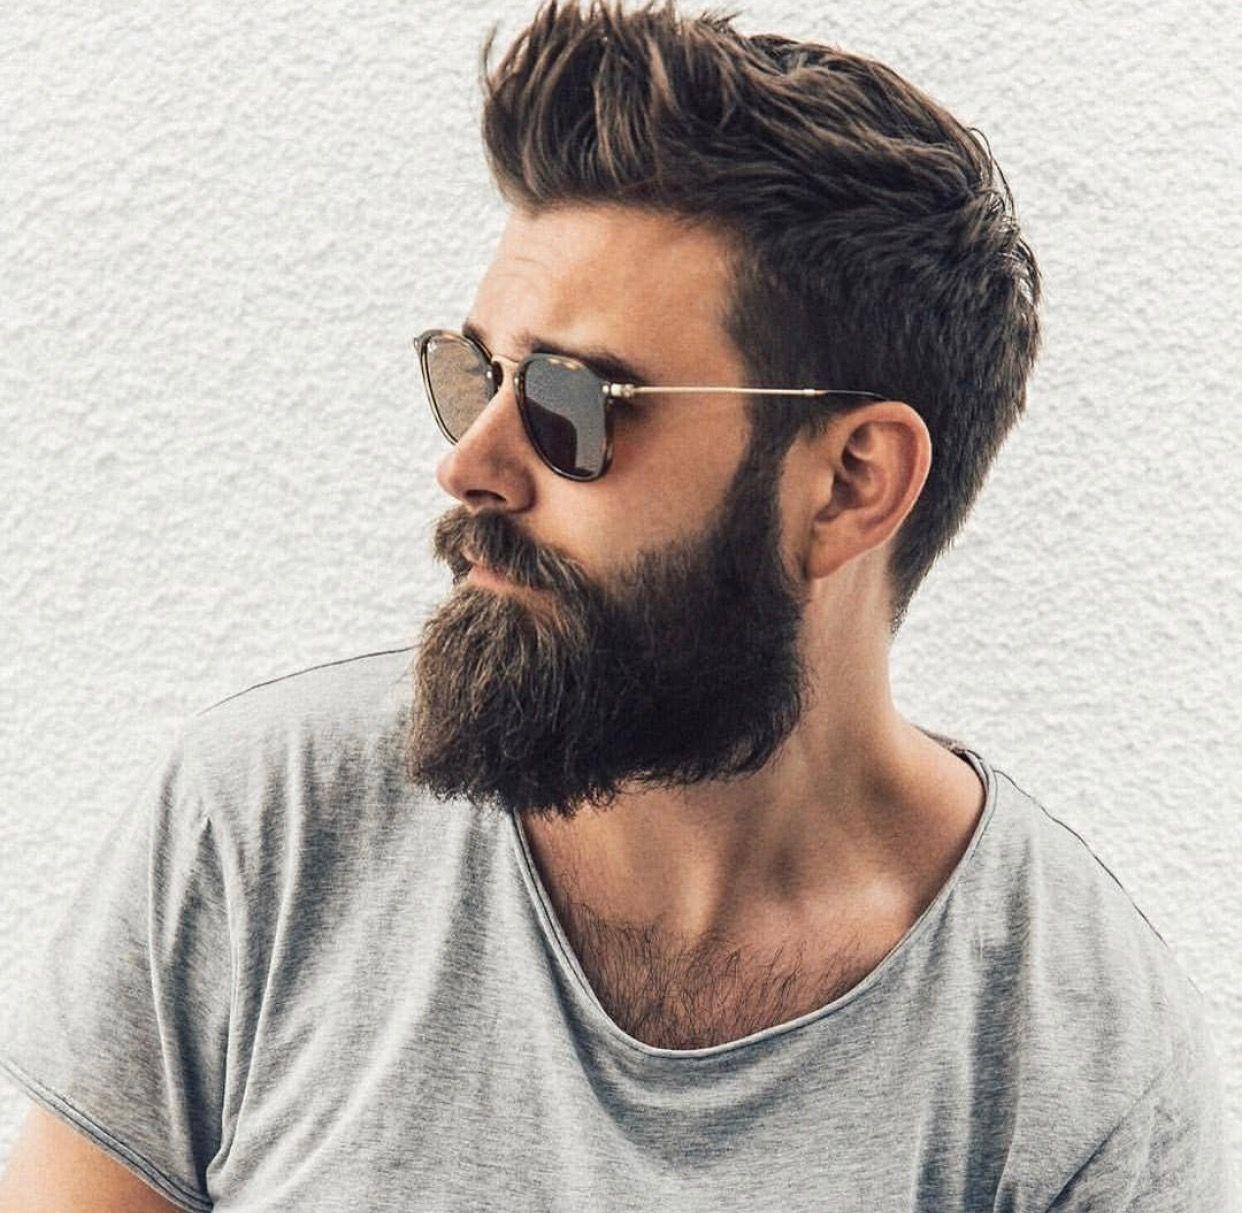 Mens haircuts with beards pin by az on beard style  pinterest  haircuts man hair and beard